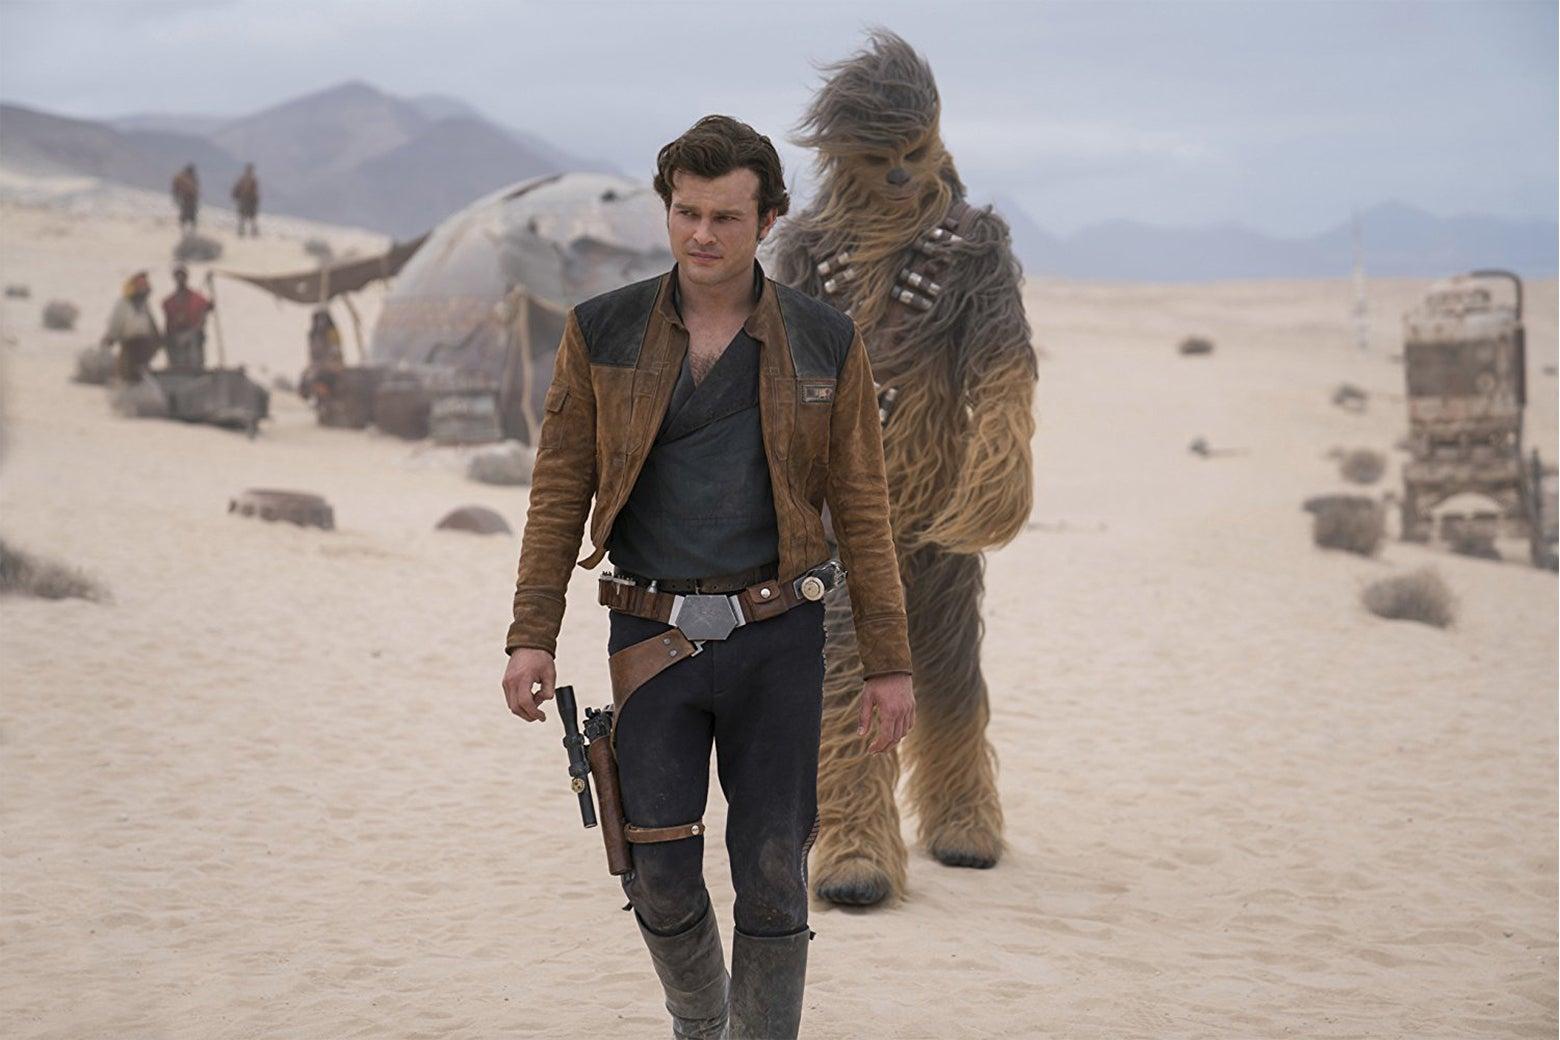 Alden Erenreich and Joonas Suotamo in Solo: A Star Wars Story.